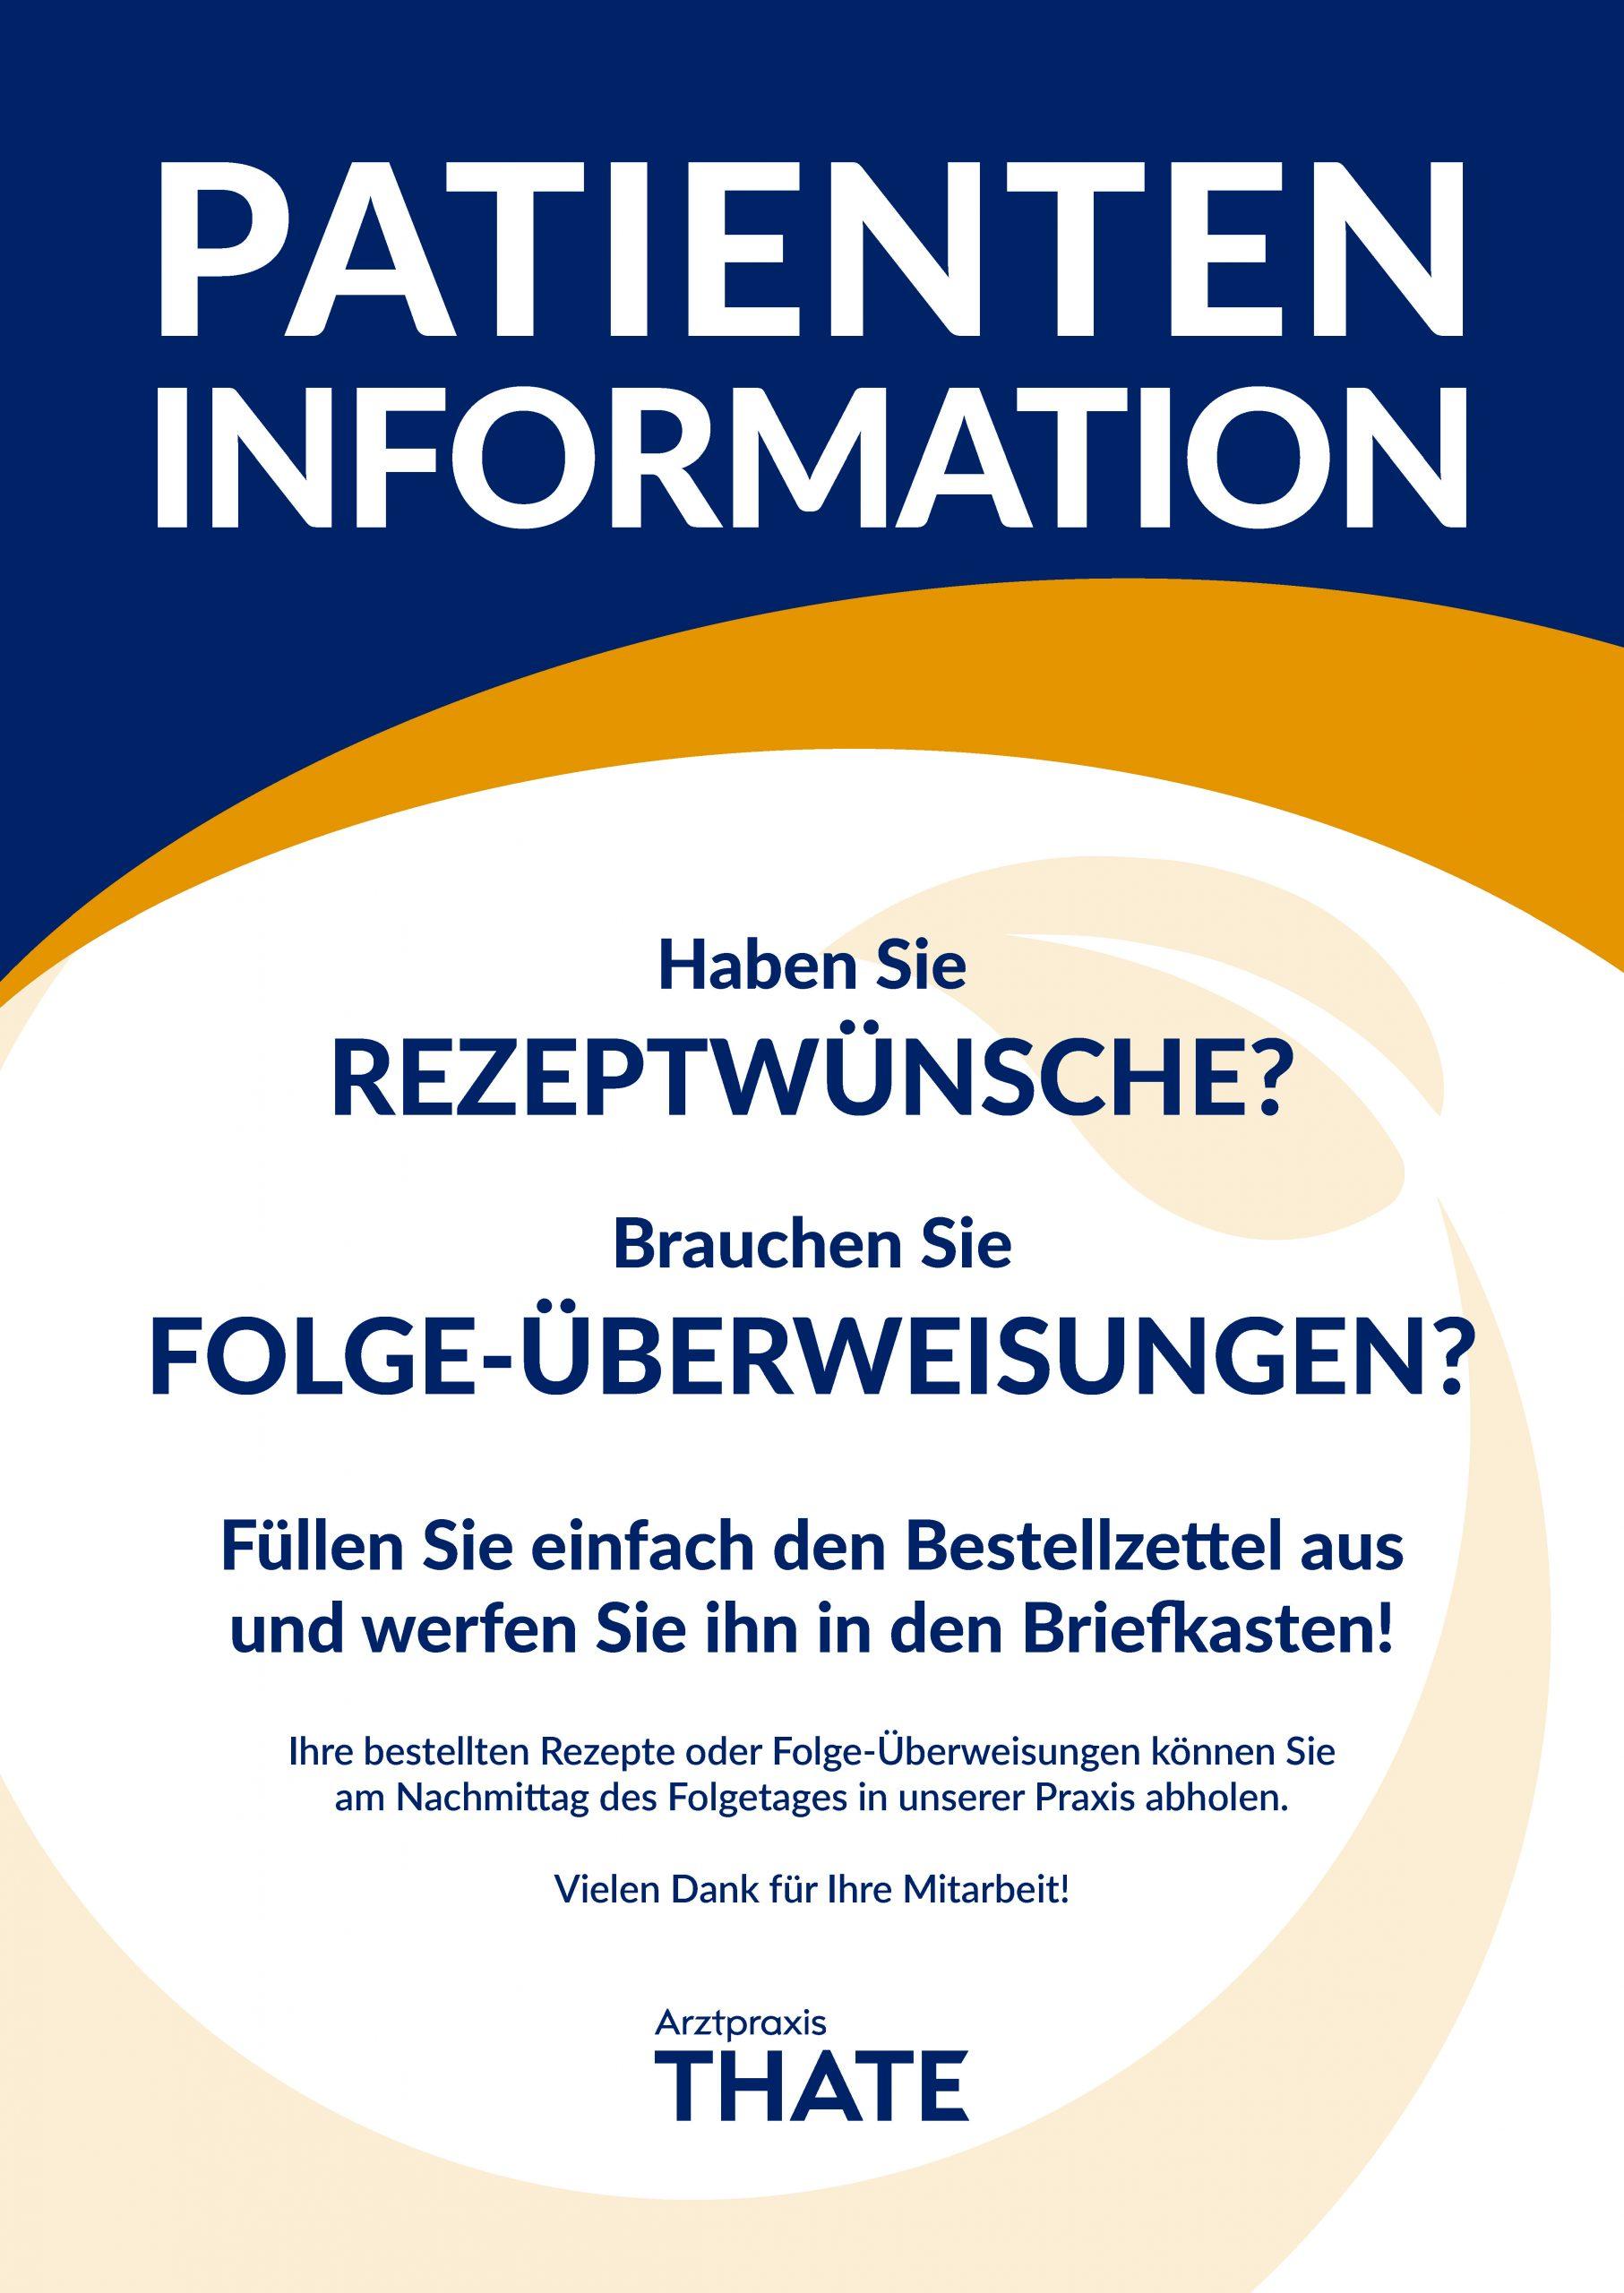 Patienteninformation Bestellzettel Arztpraxis Thate